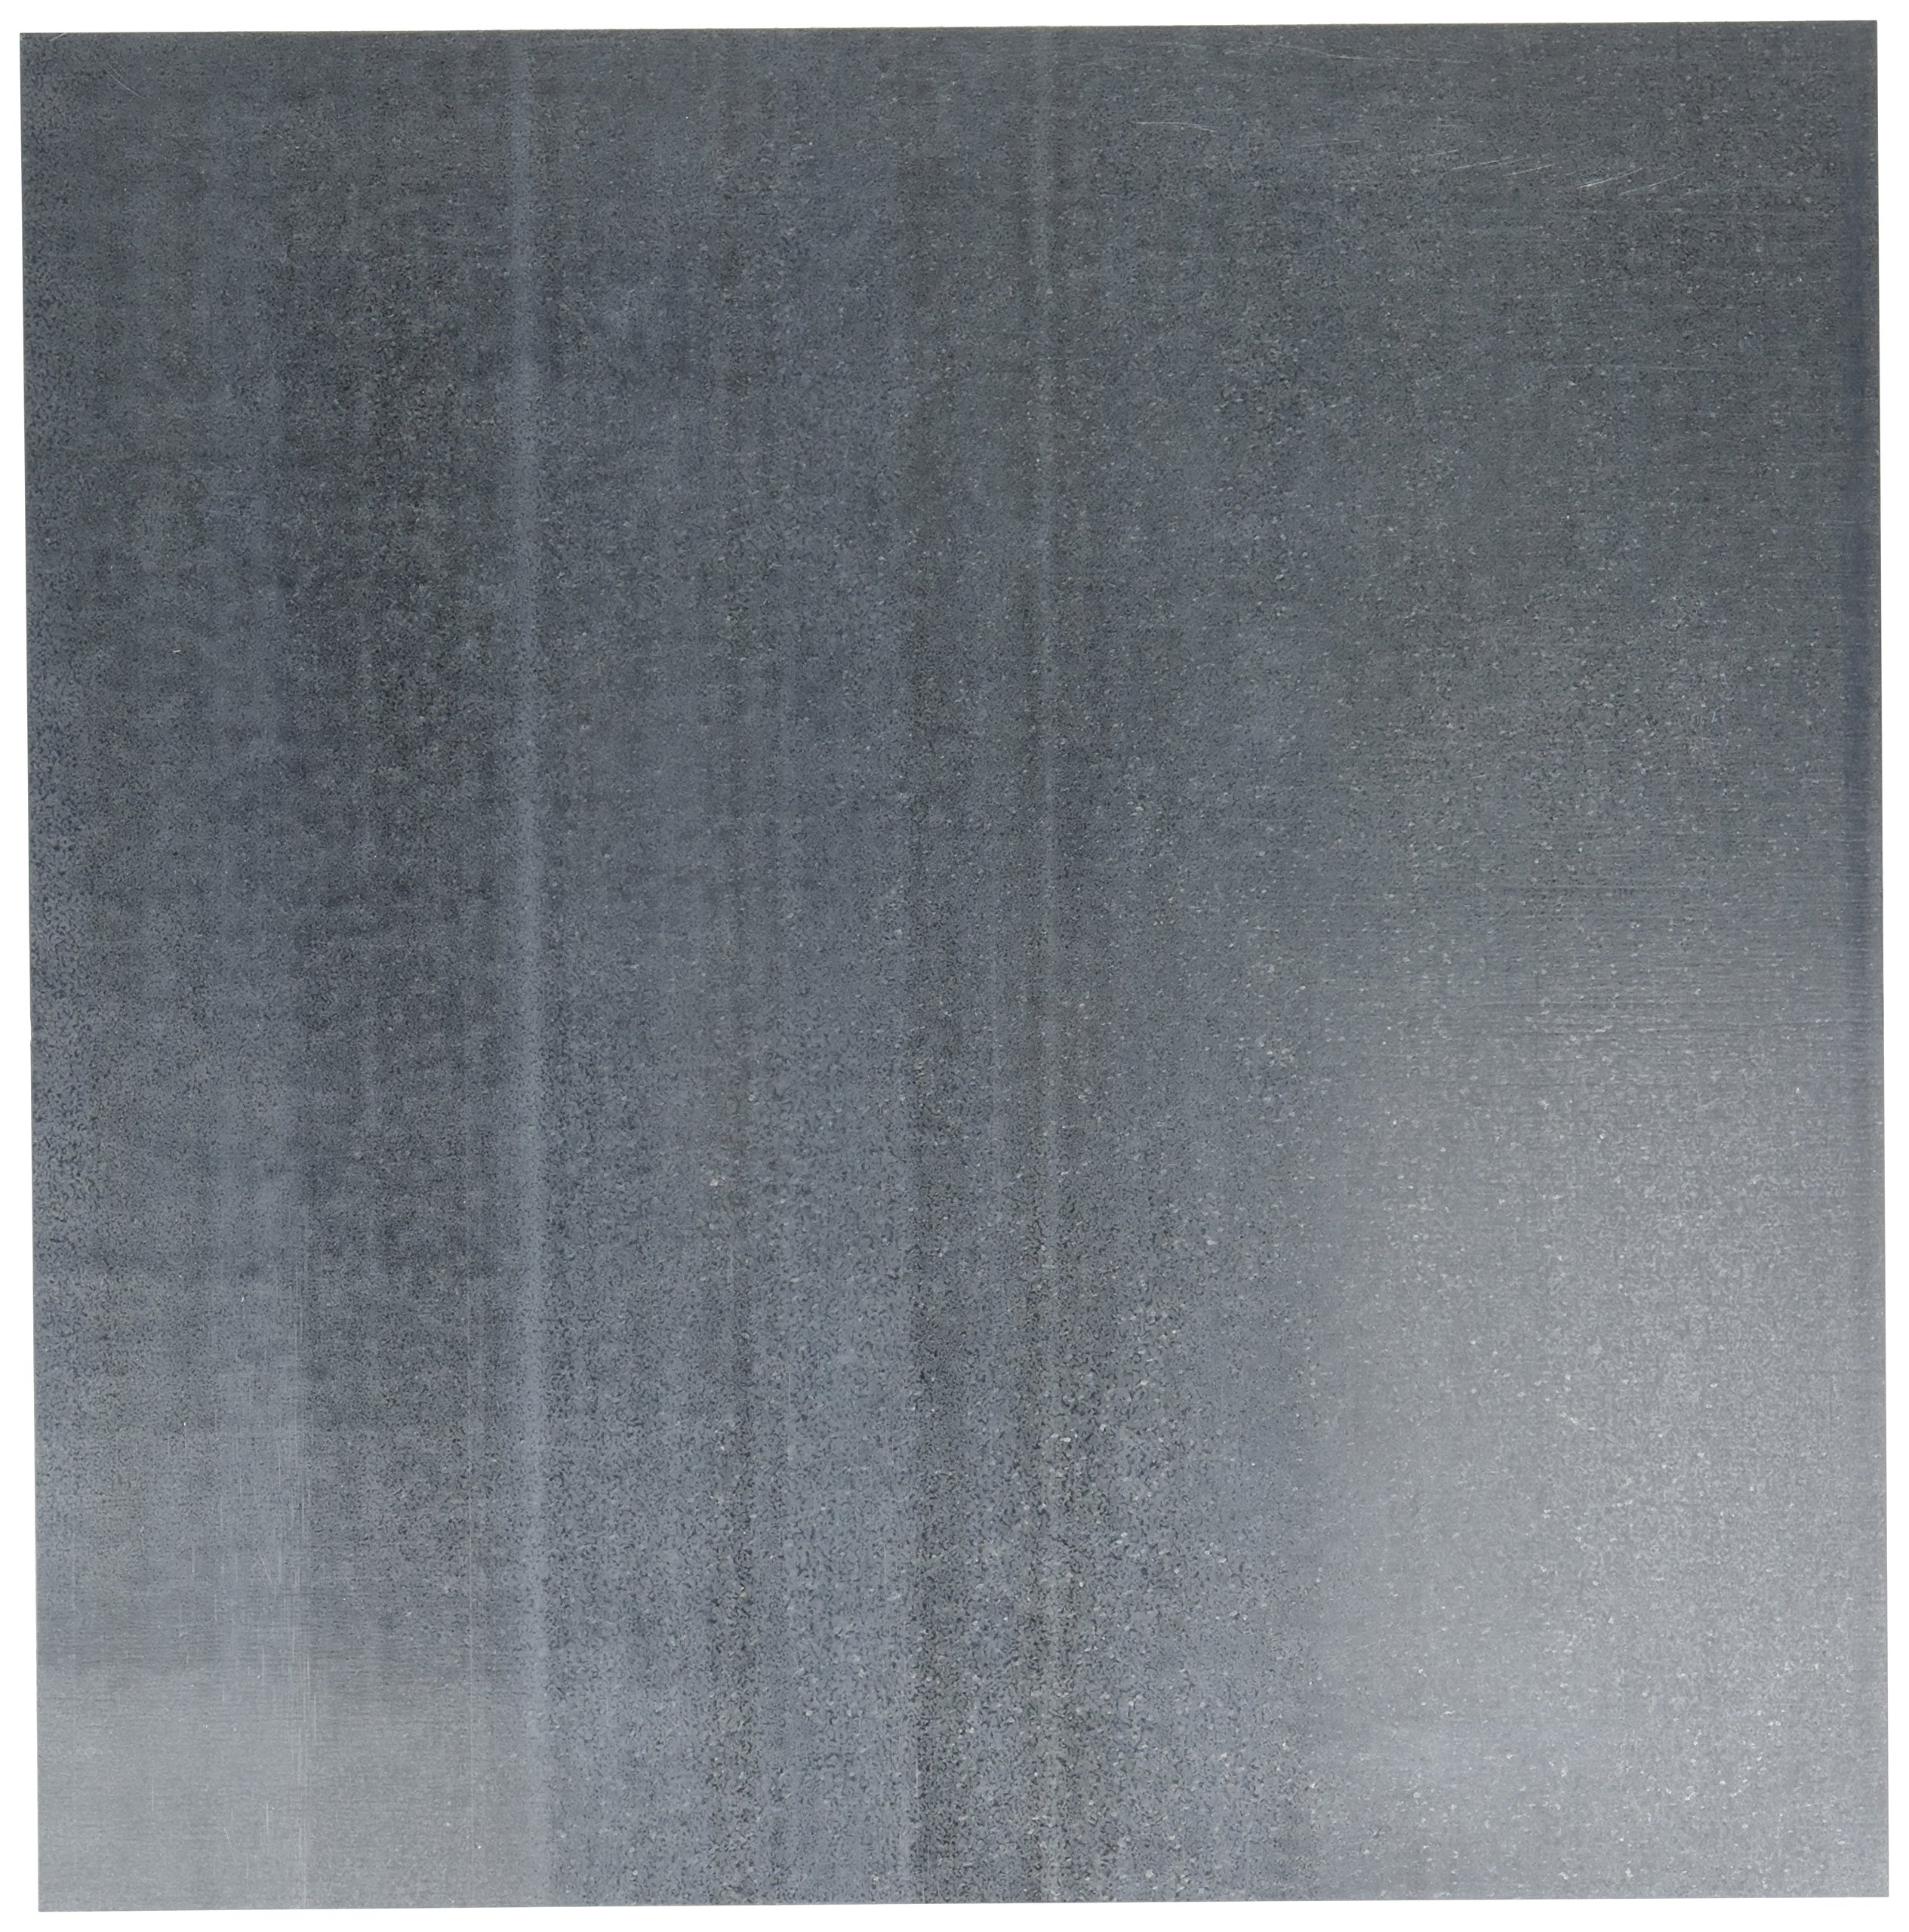 M-D Hobby & Craft Galvanized Steel Sheet